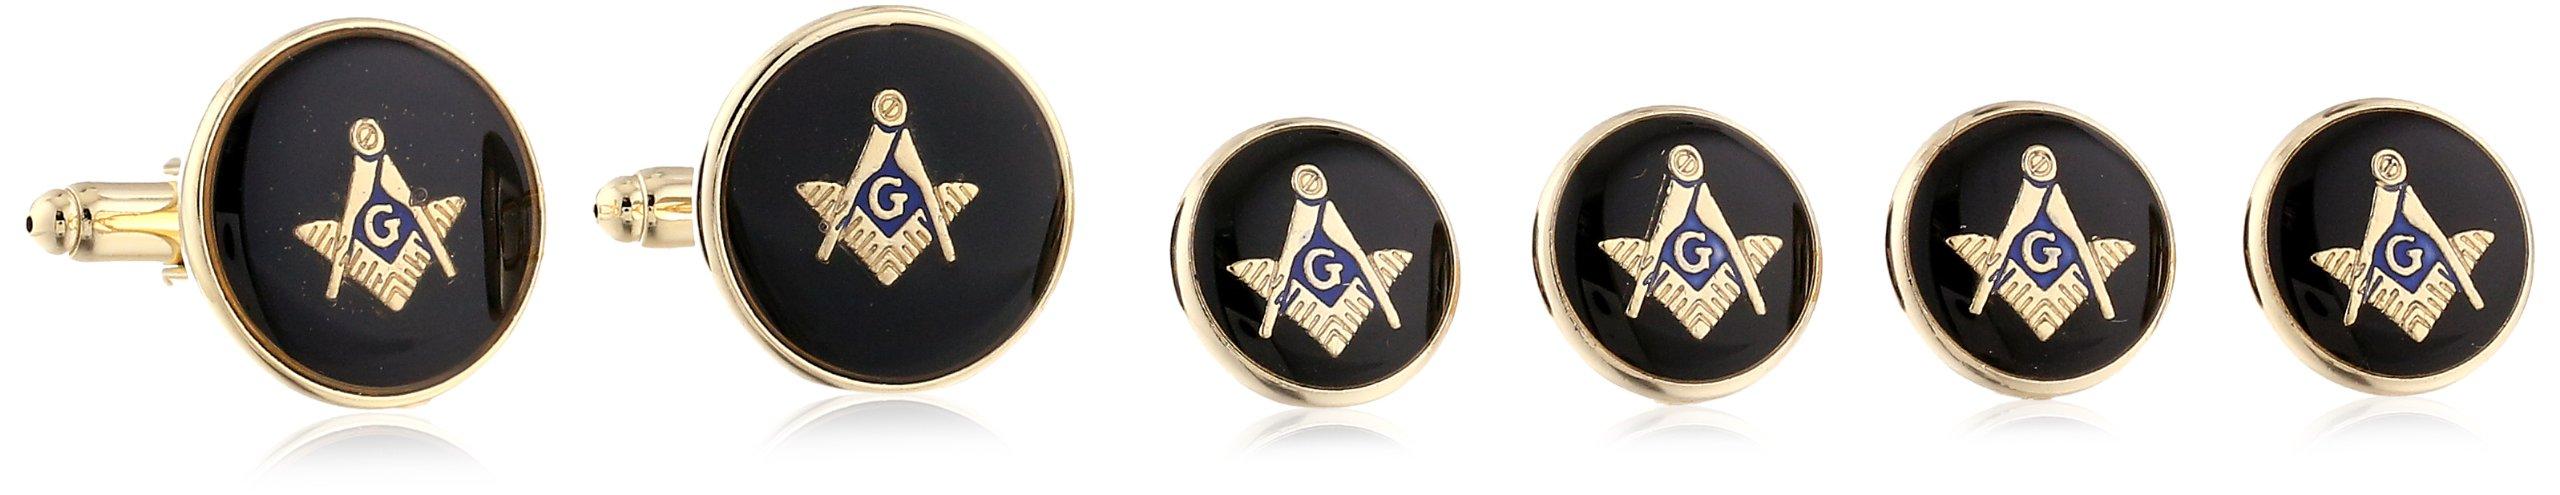 Status Men's Stud Set Masonic Round with Black Enamel With Masonic Compass, Gold, One Size